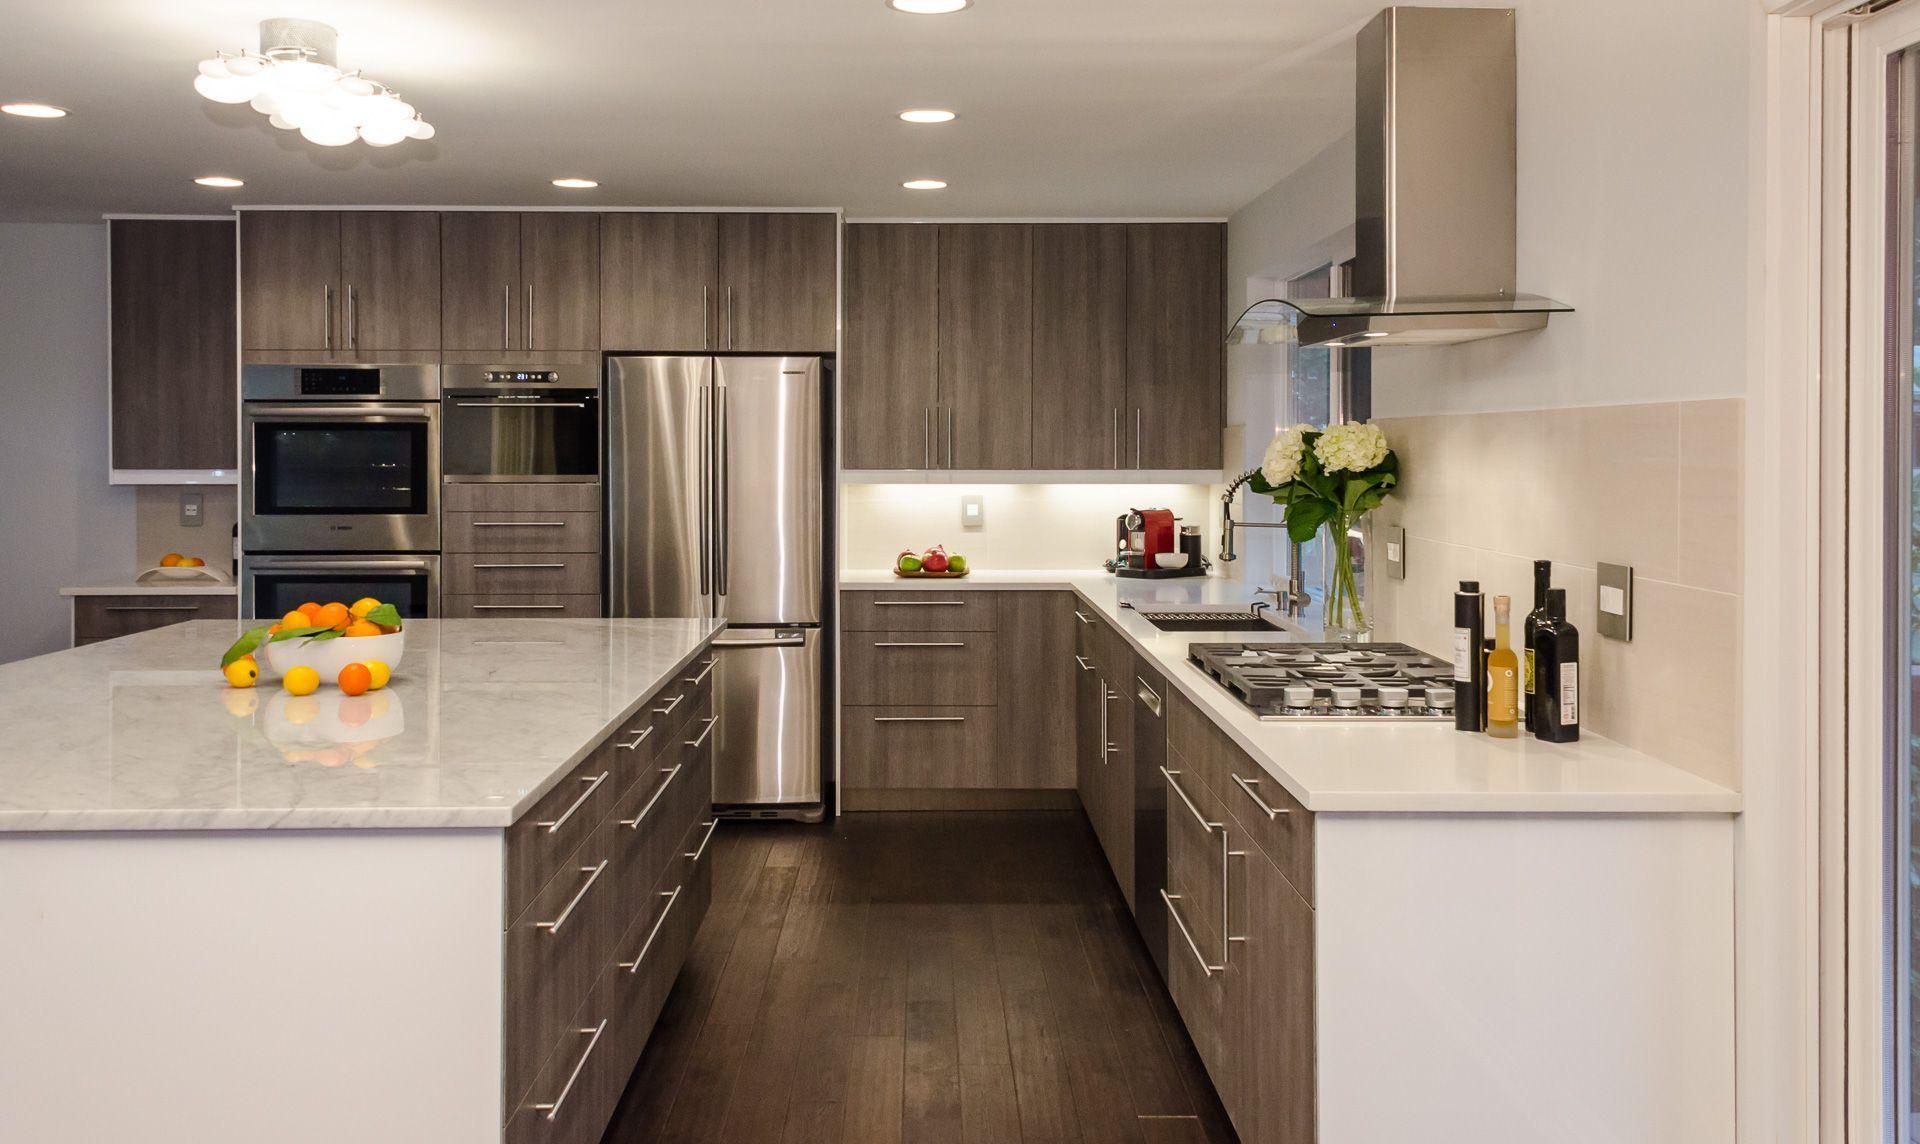 sofielund brokhult ikea kitchen design t kitchens and